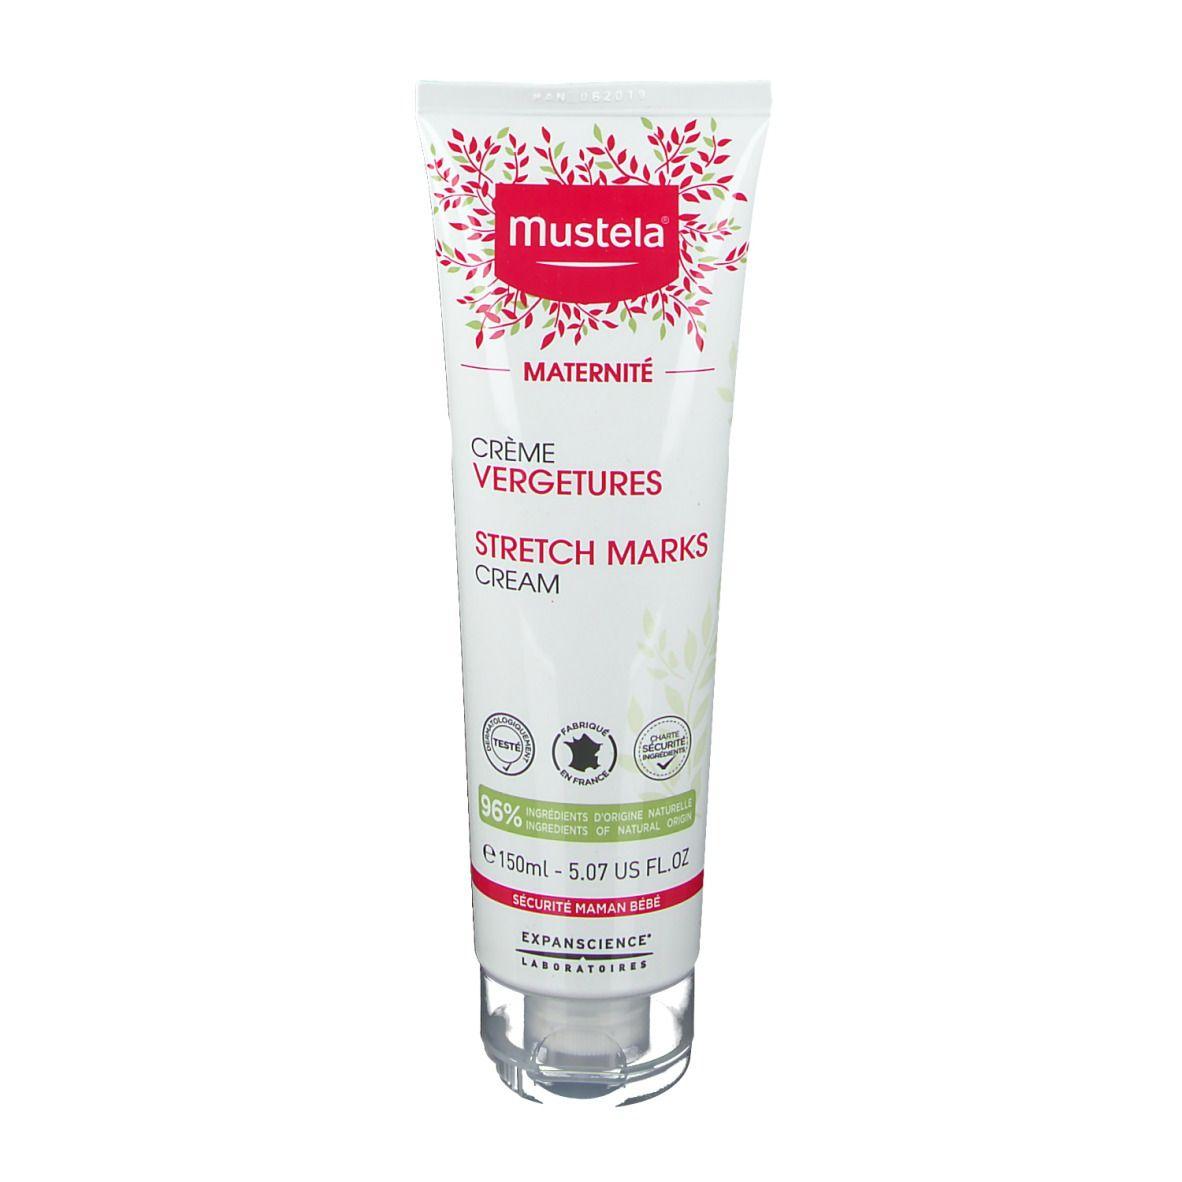 Mustela® Crème Vergetures Action 3 en 1